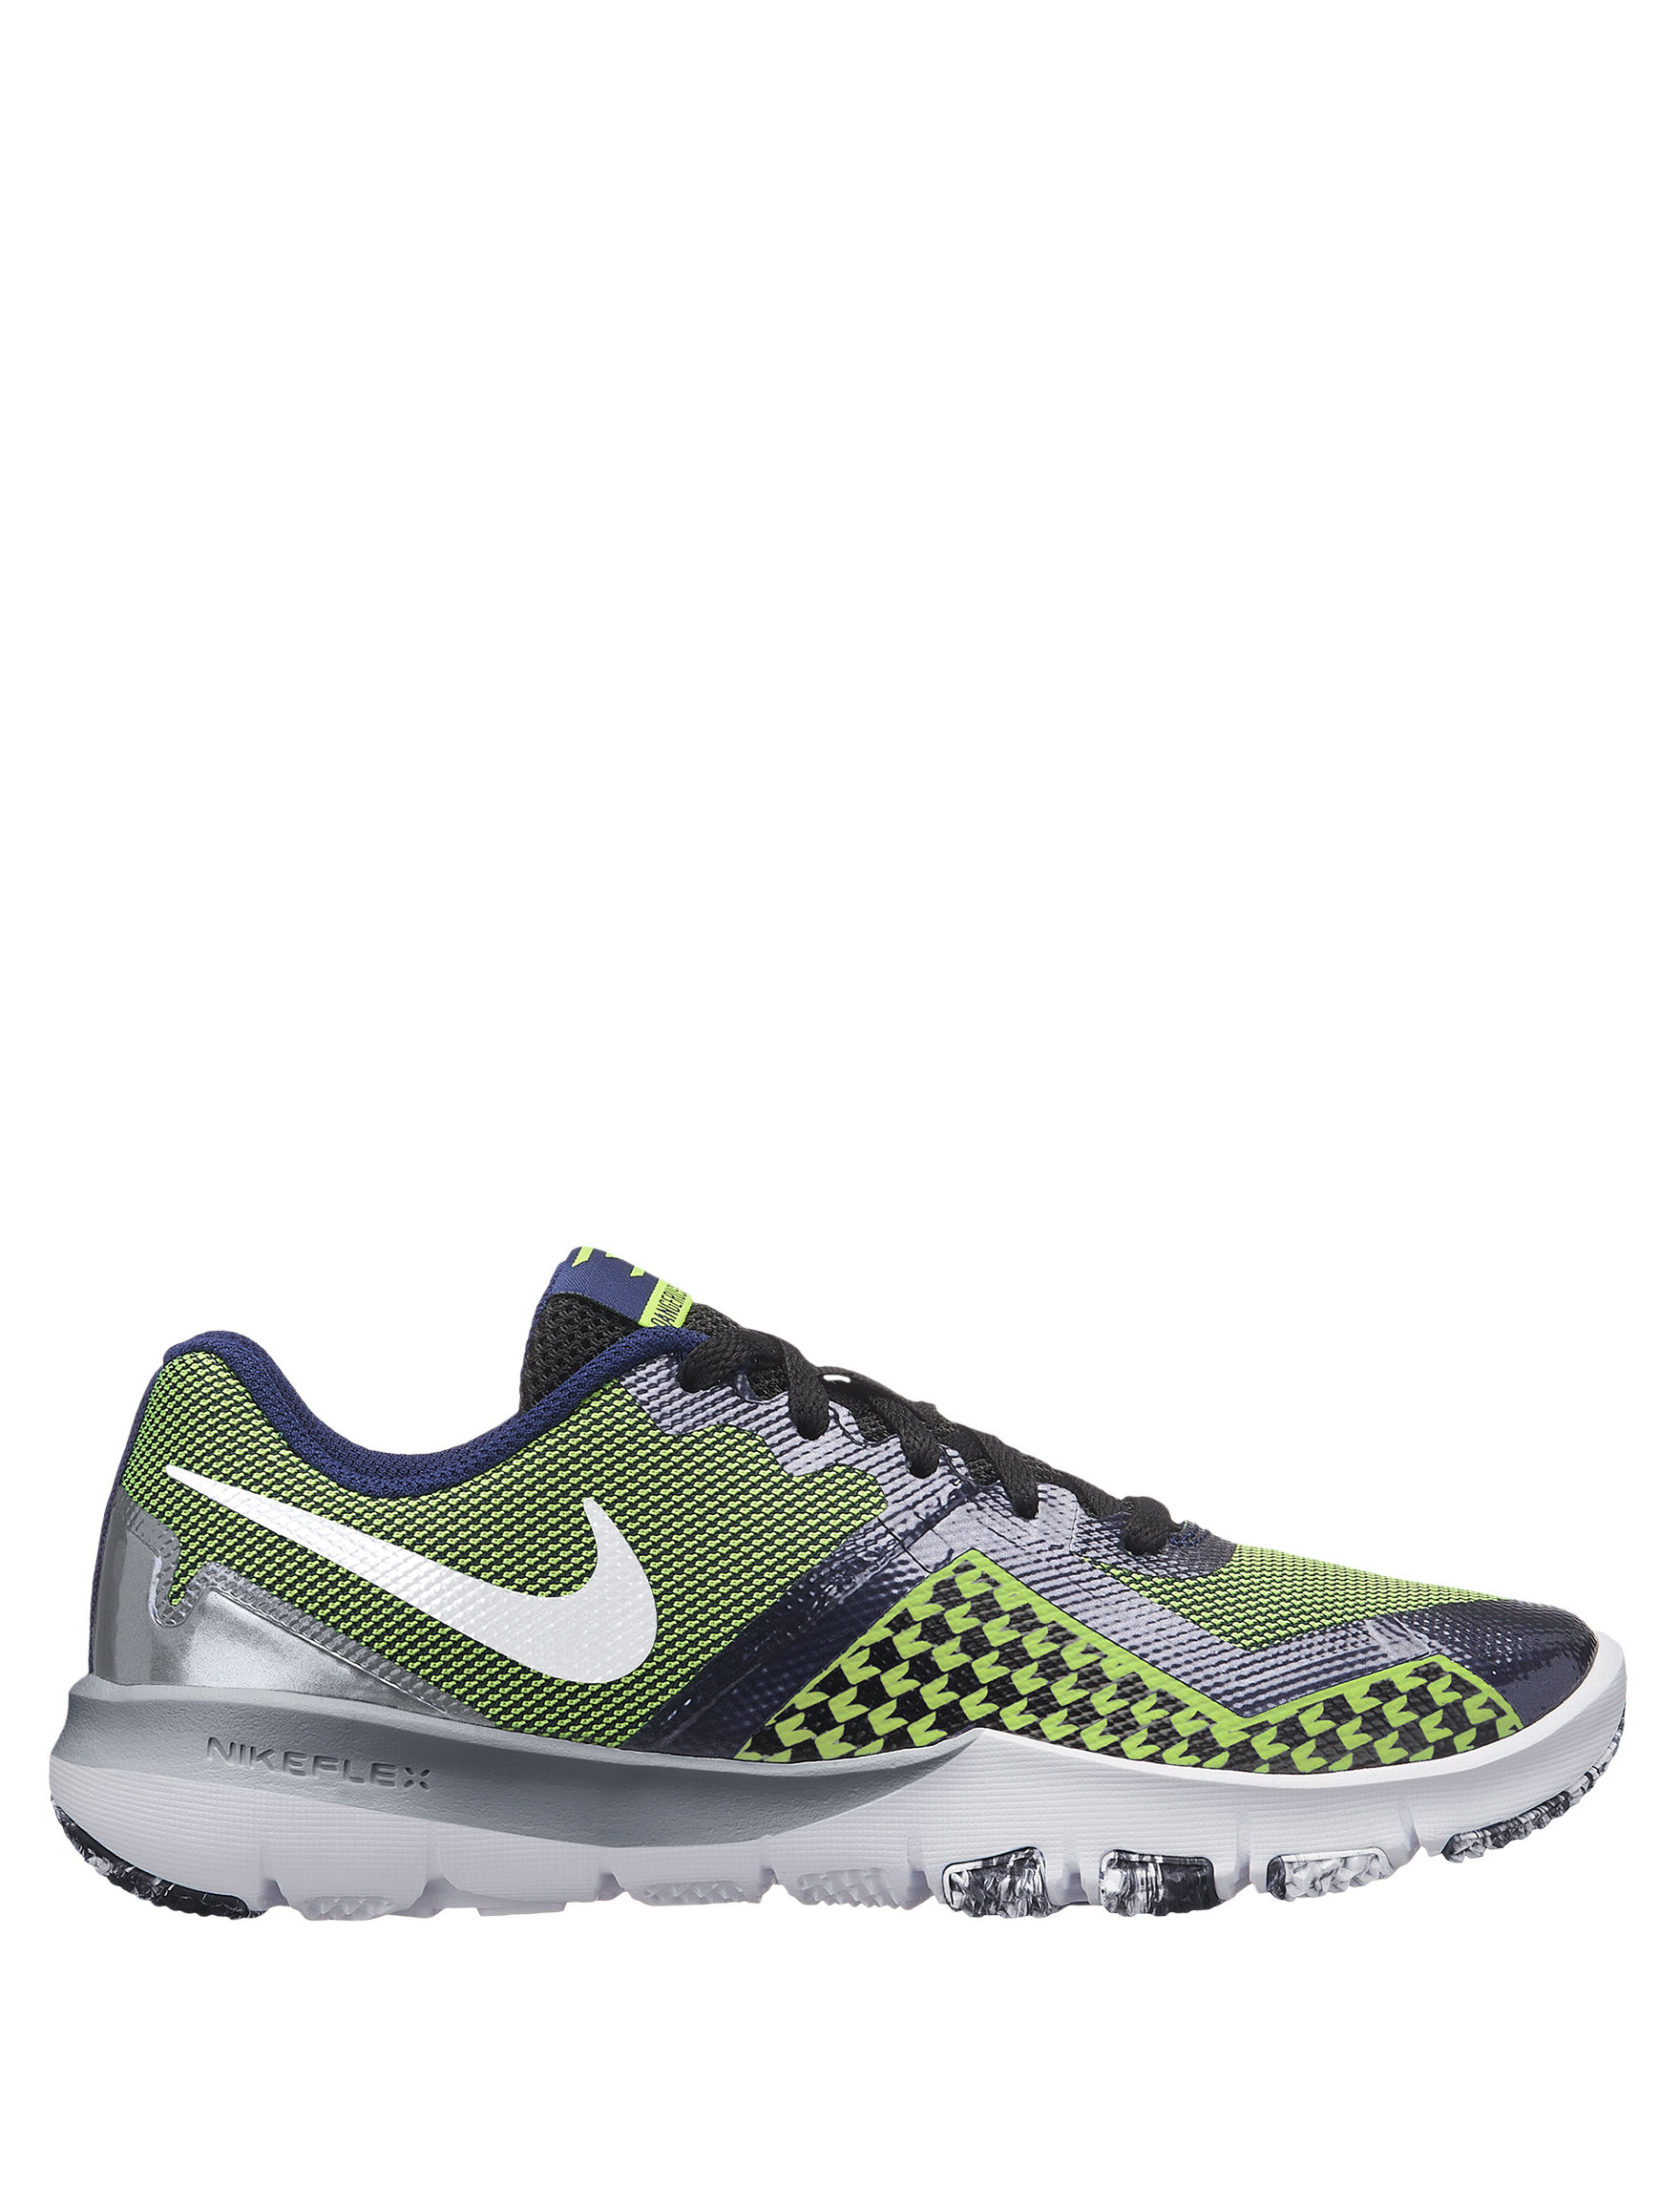 brand new 95844 ac3fc Nike Flex Control II RW Training Shoes - Boys 4-7 | Stage Stores